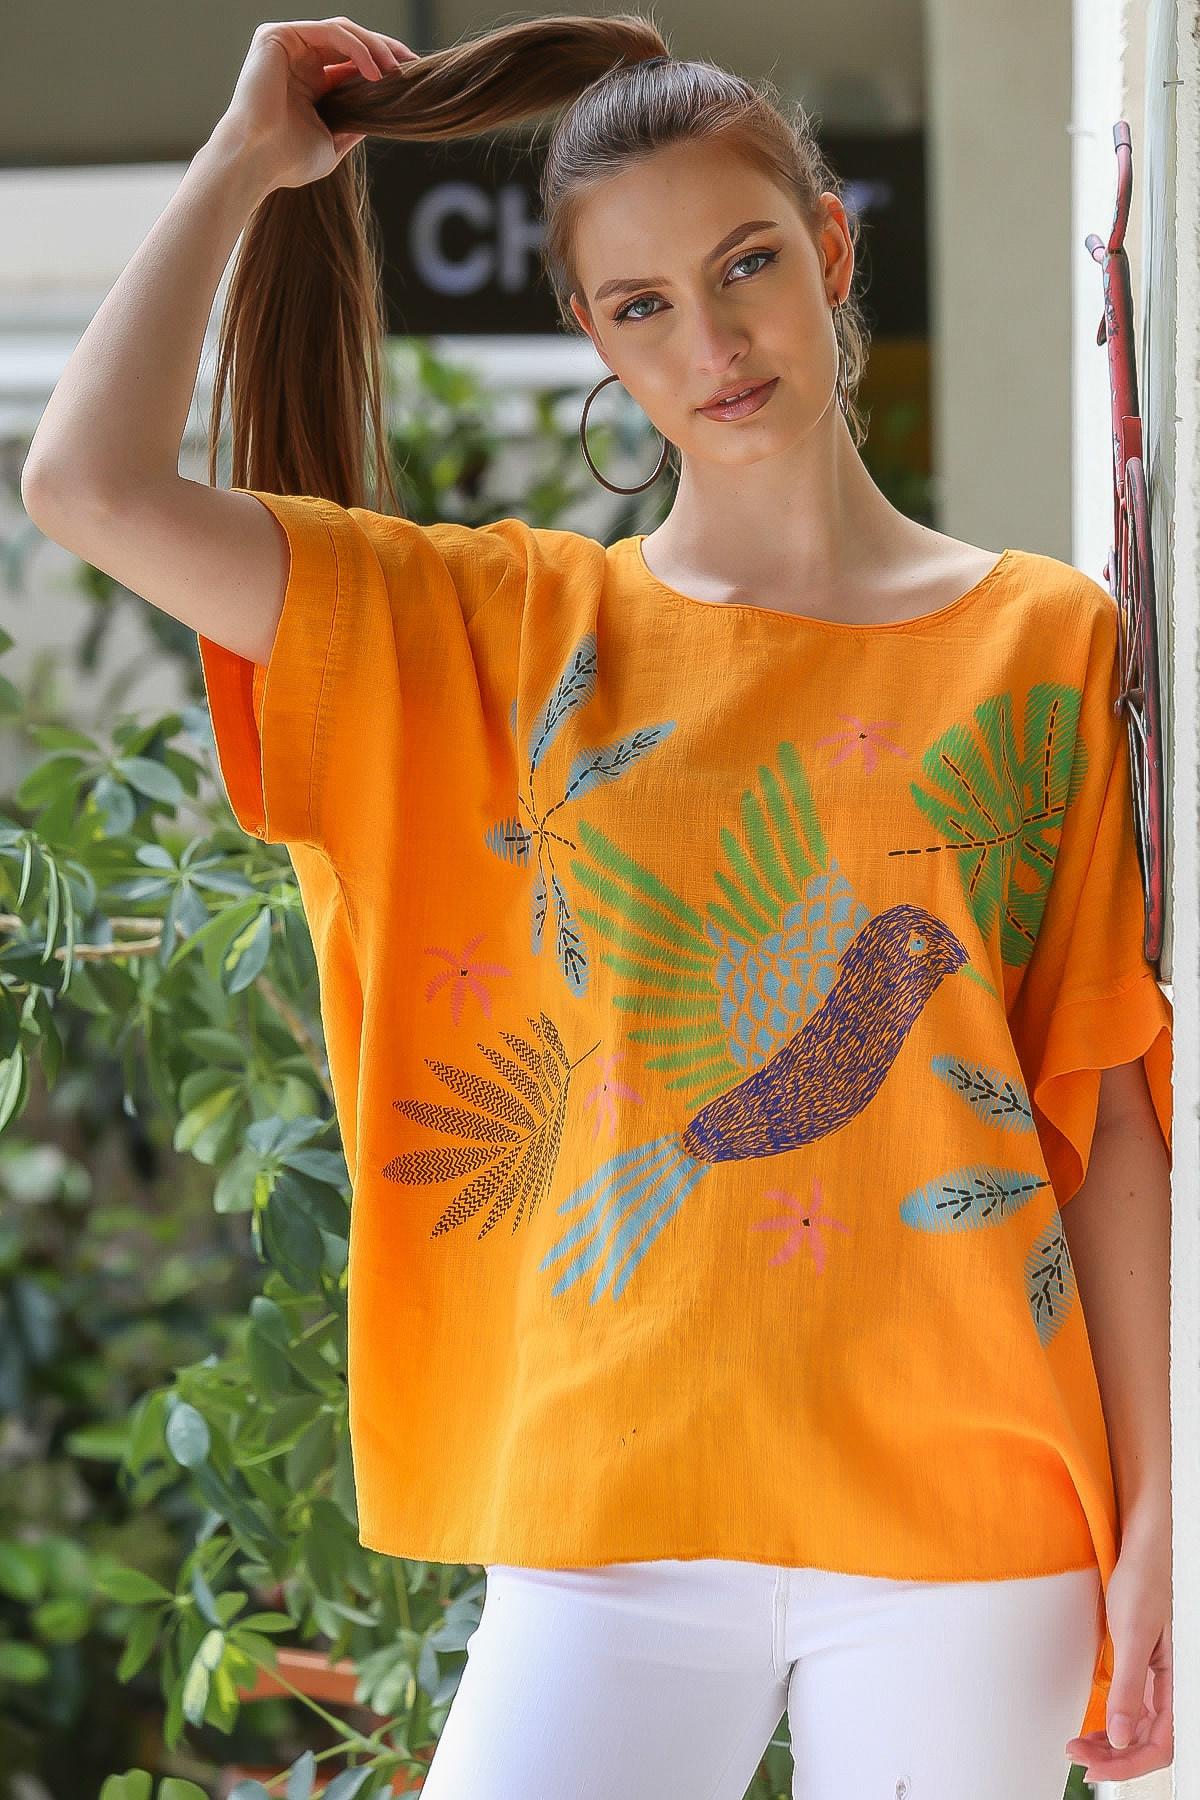 Chiccy Kadın Turuncu  Sıfır Yaka Yalı Çapkını Kuş Desenli Salaş Dokuma Bluz M10010200BL95418